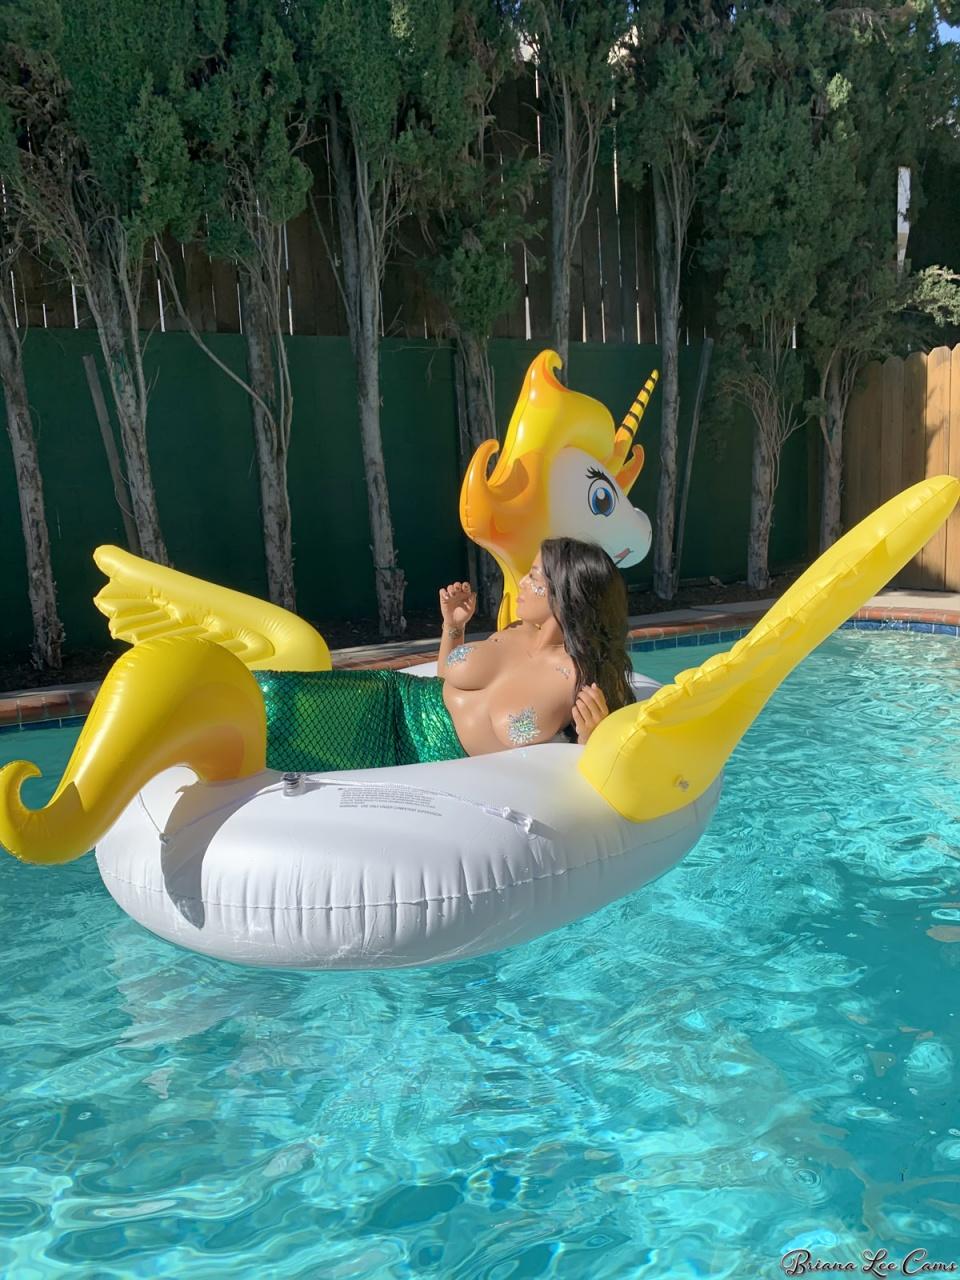 Briana Lee - Sexy Mermaid